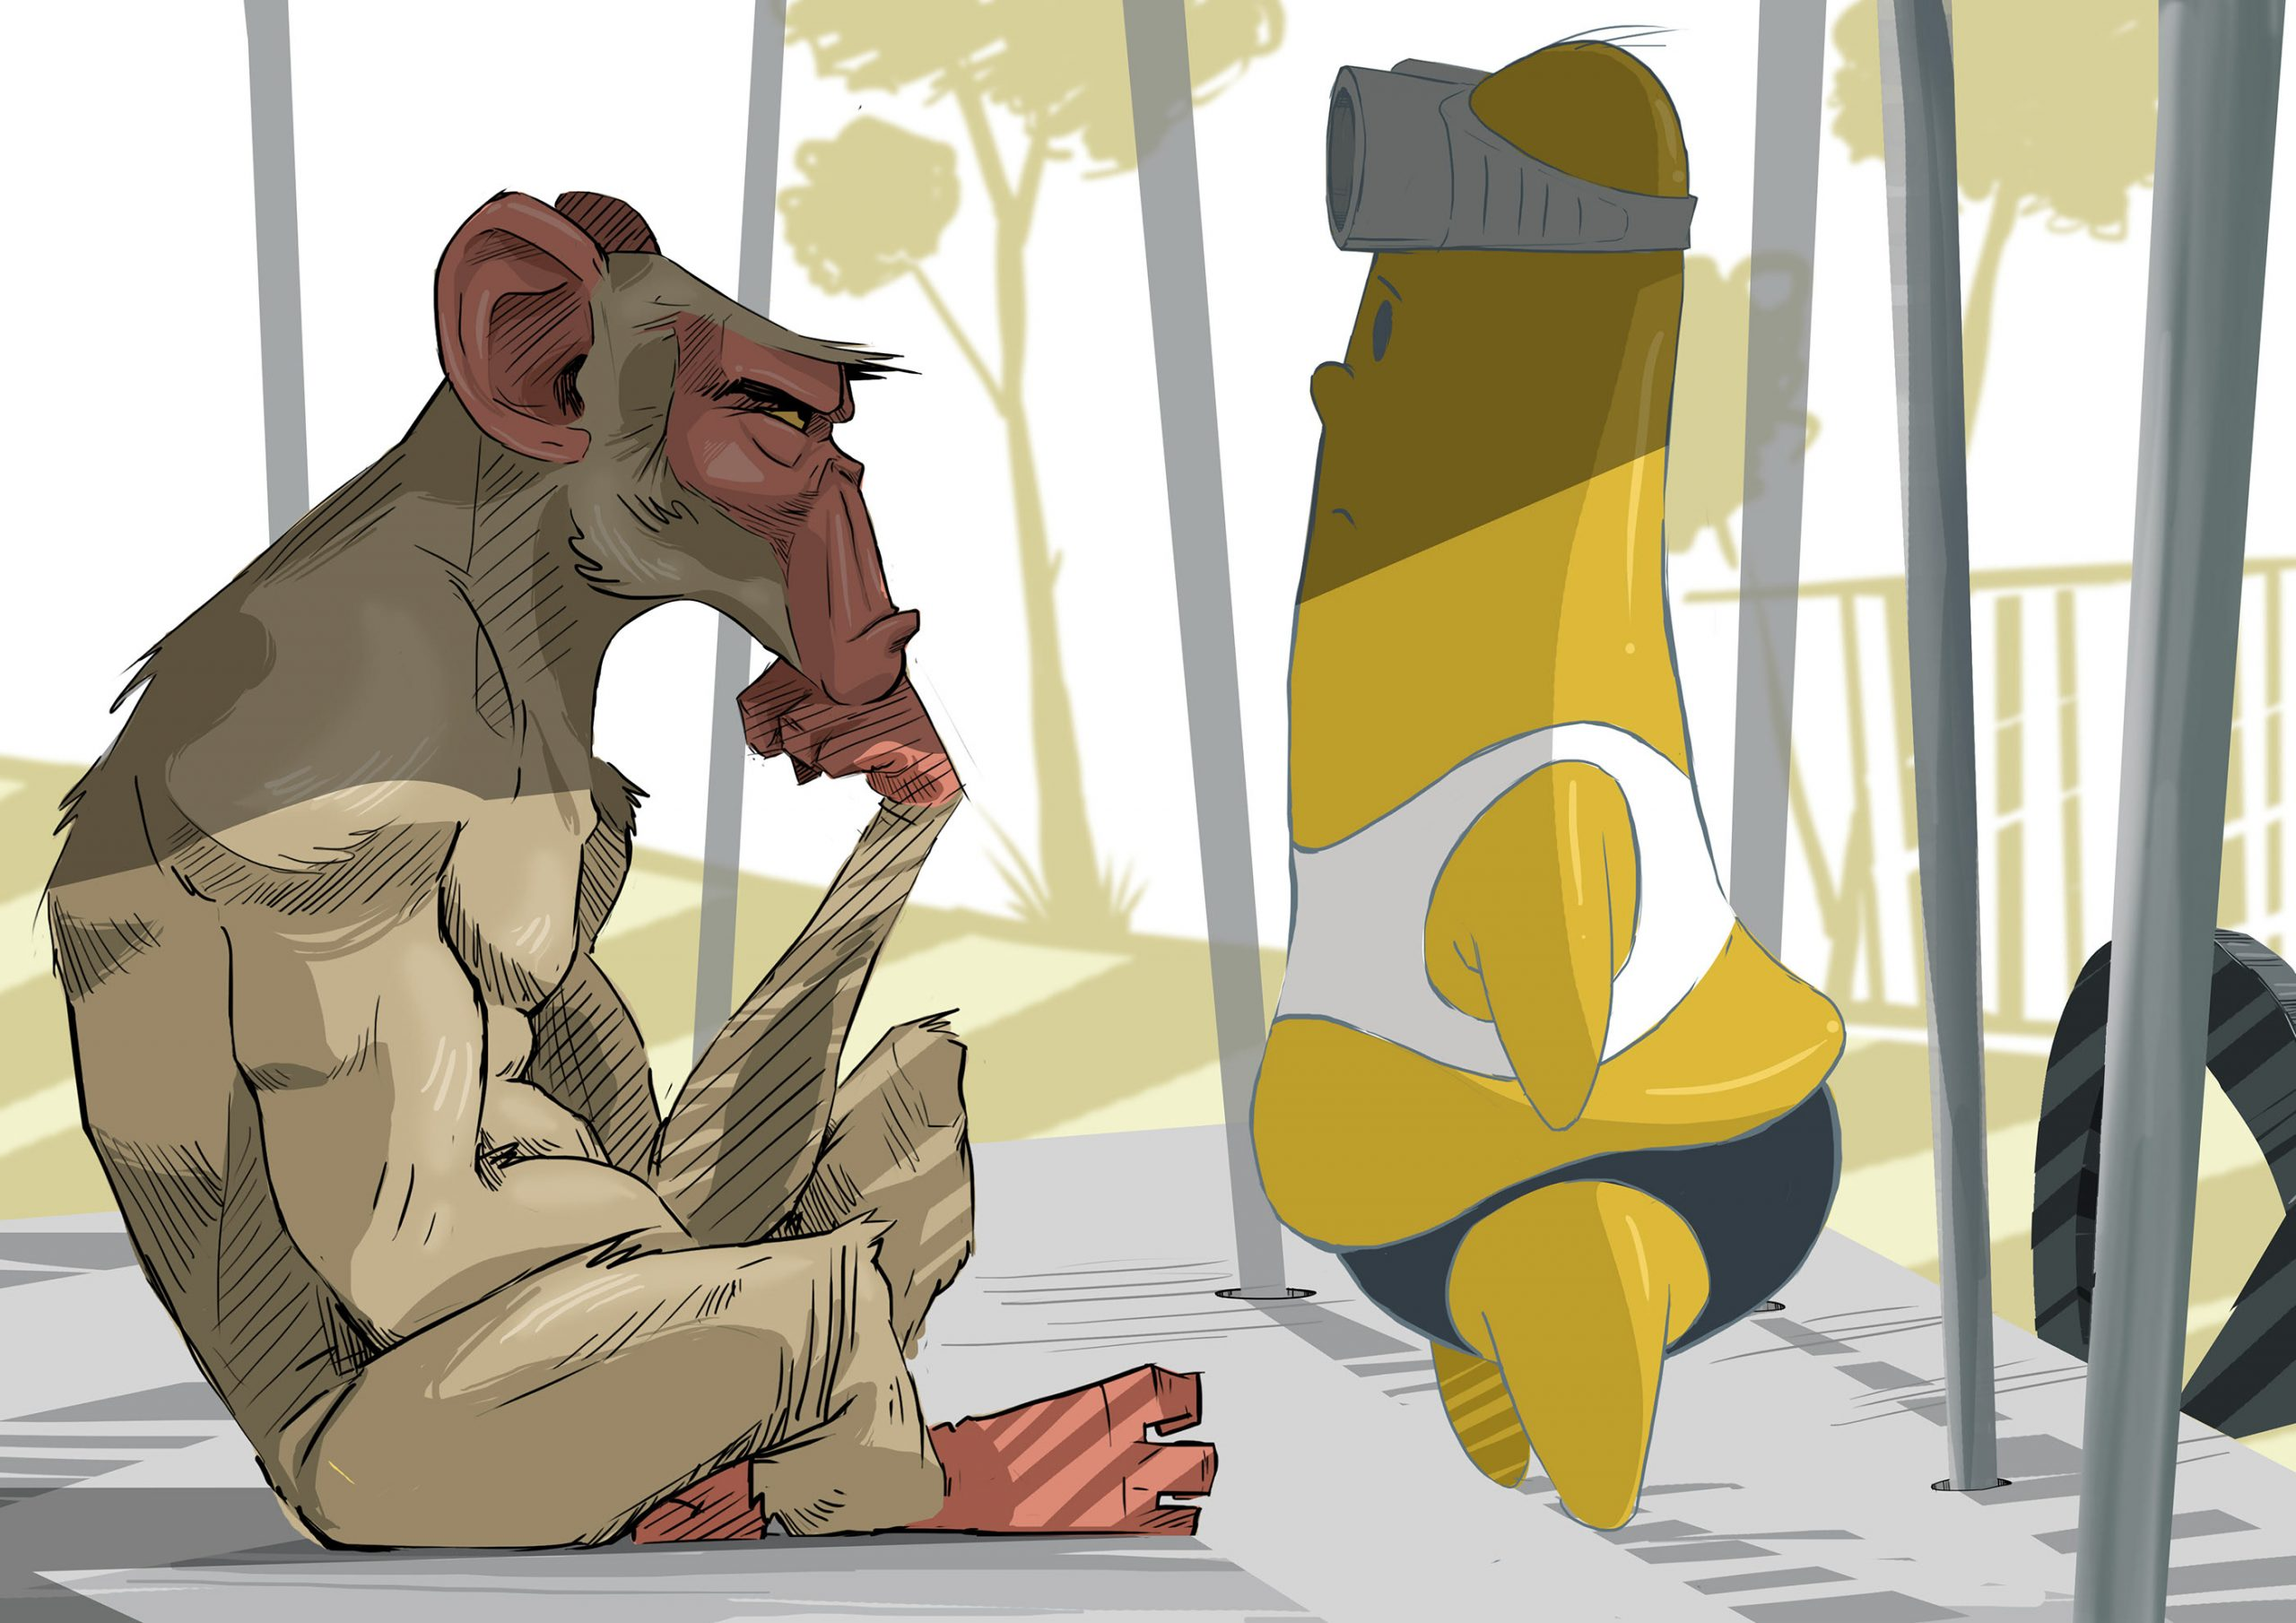 Monkey Business by Mogau Kekana